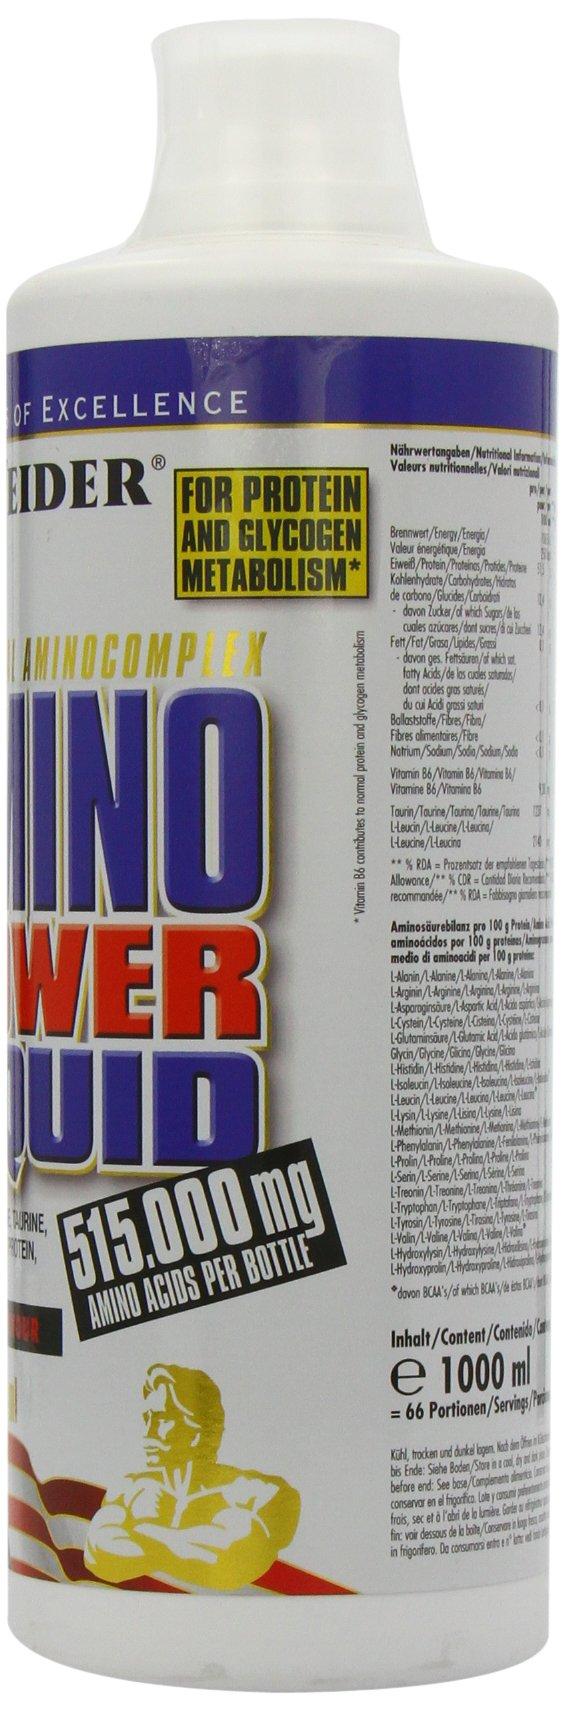 718X%2BmTI6vL - Weider Amino Power Liquid 1L Energy, Essential Amino Acids, L-leucine, Free Taurine, Vitamin B8